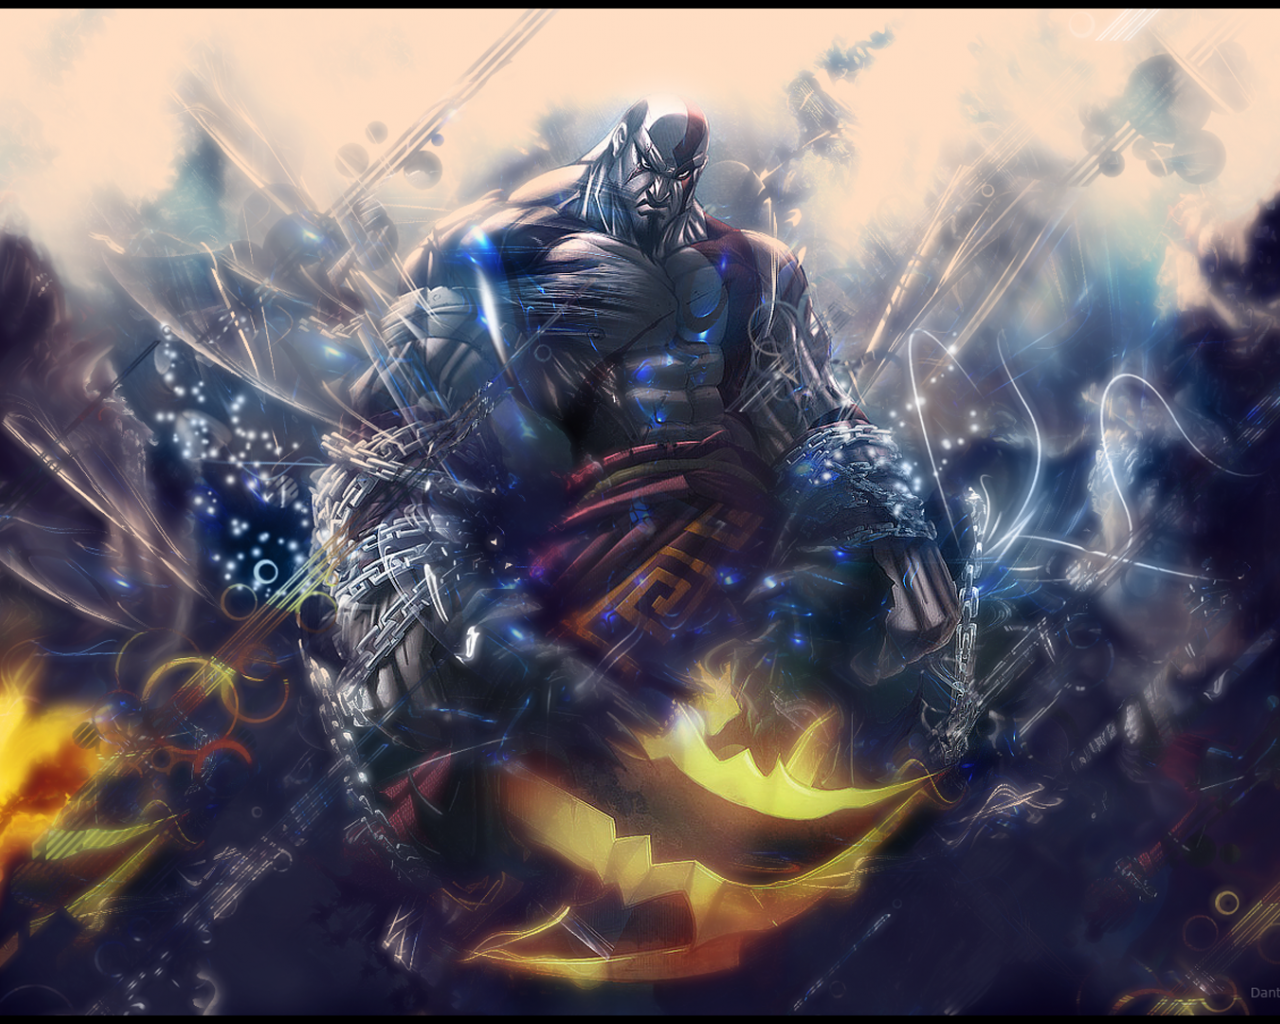 Free Download Kratos God Of War Tattoo Video Game Hd